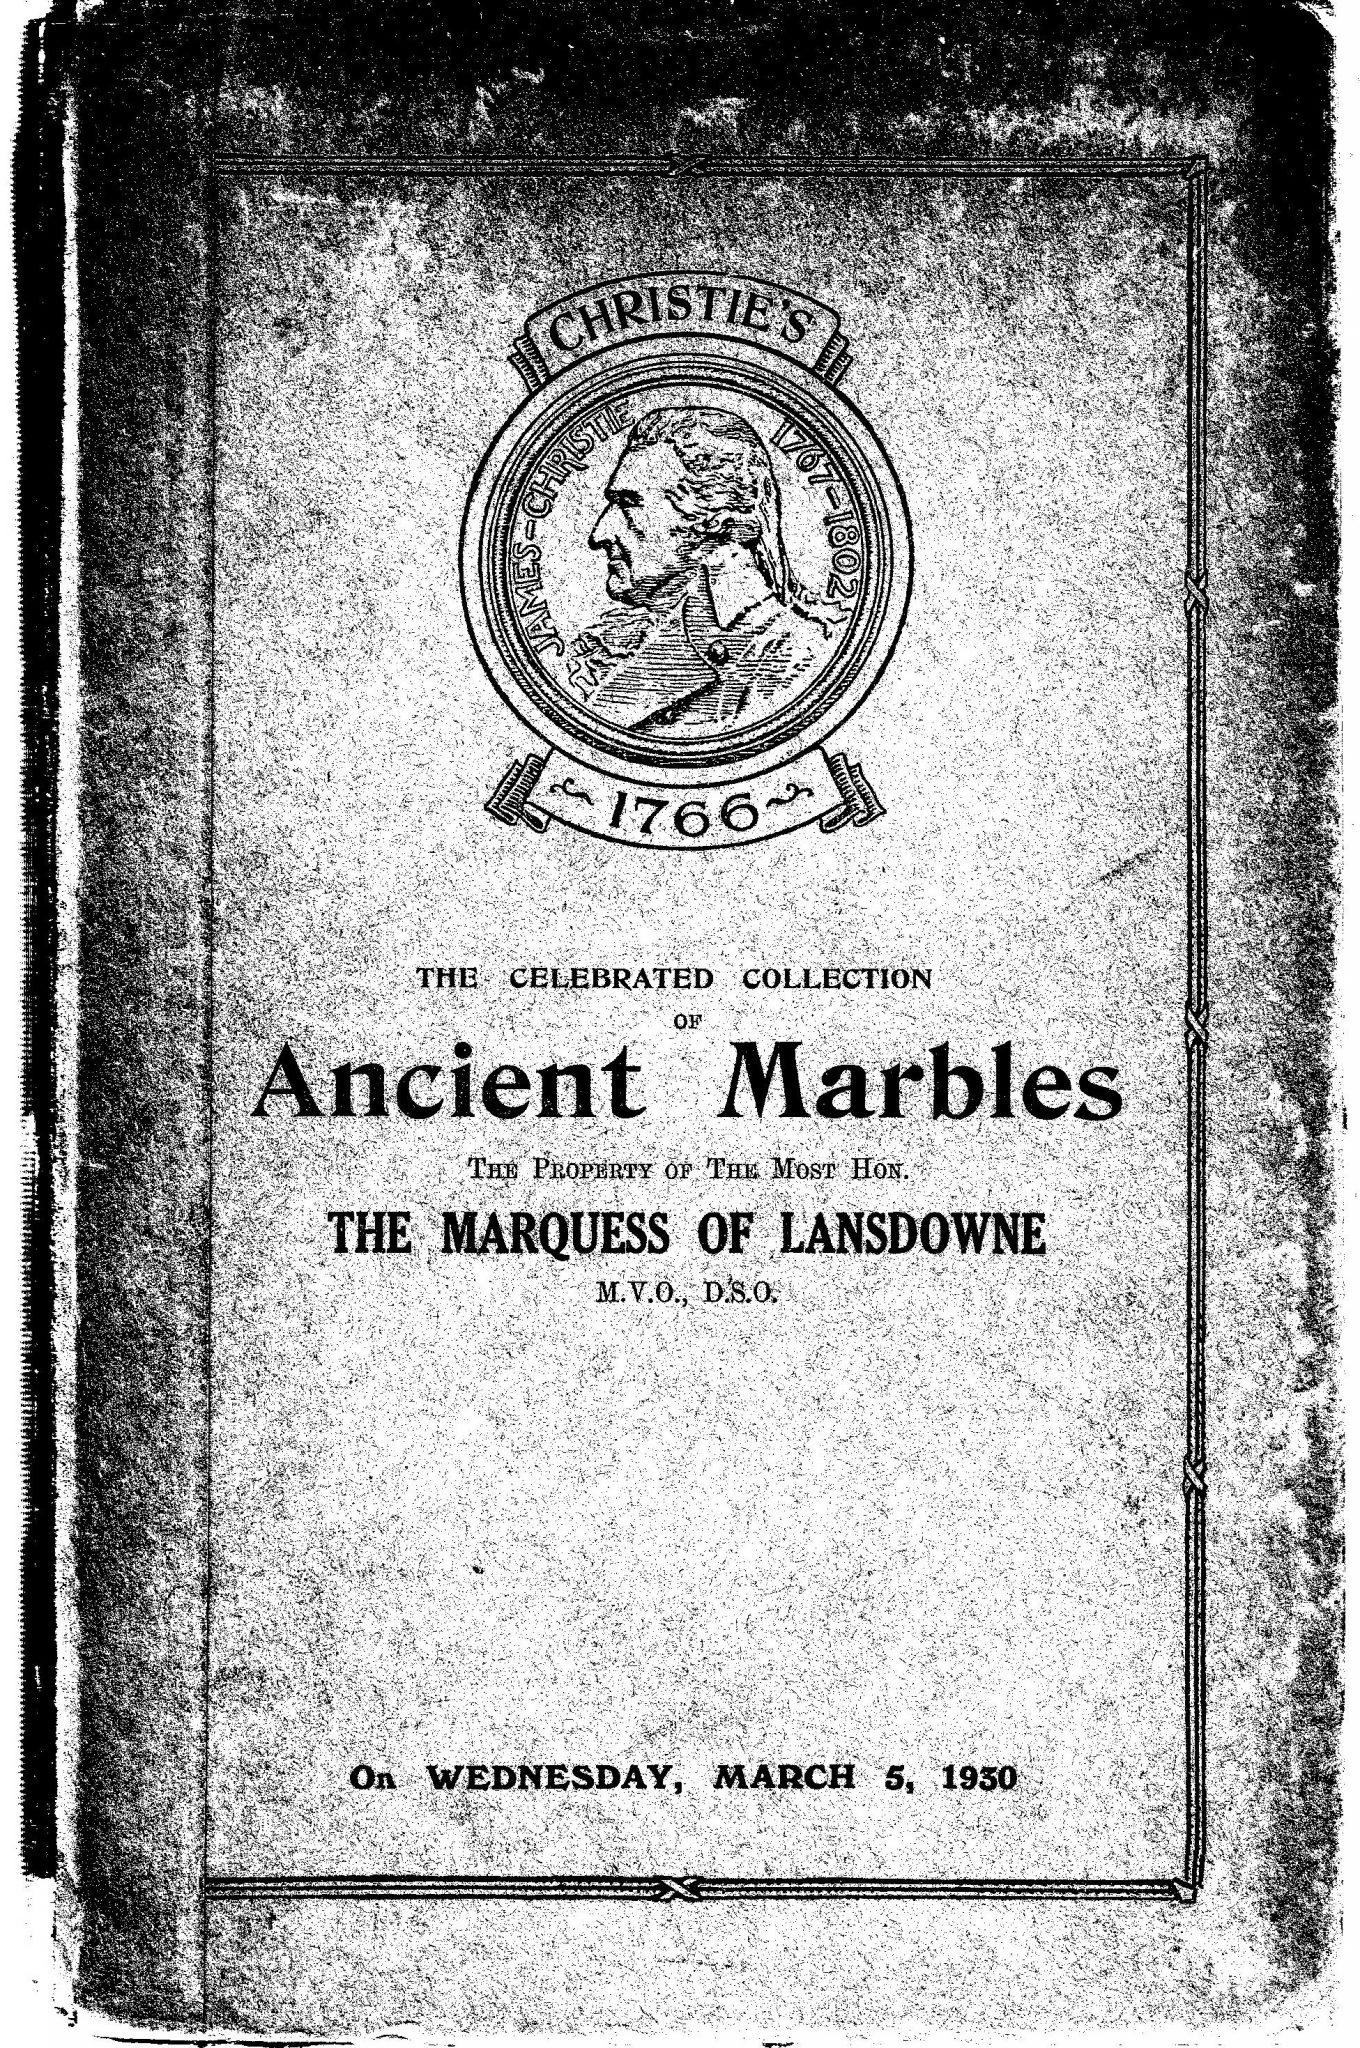 Ancient Marbles PSL/1930/0007b 1